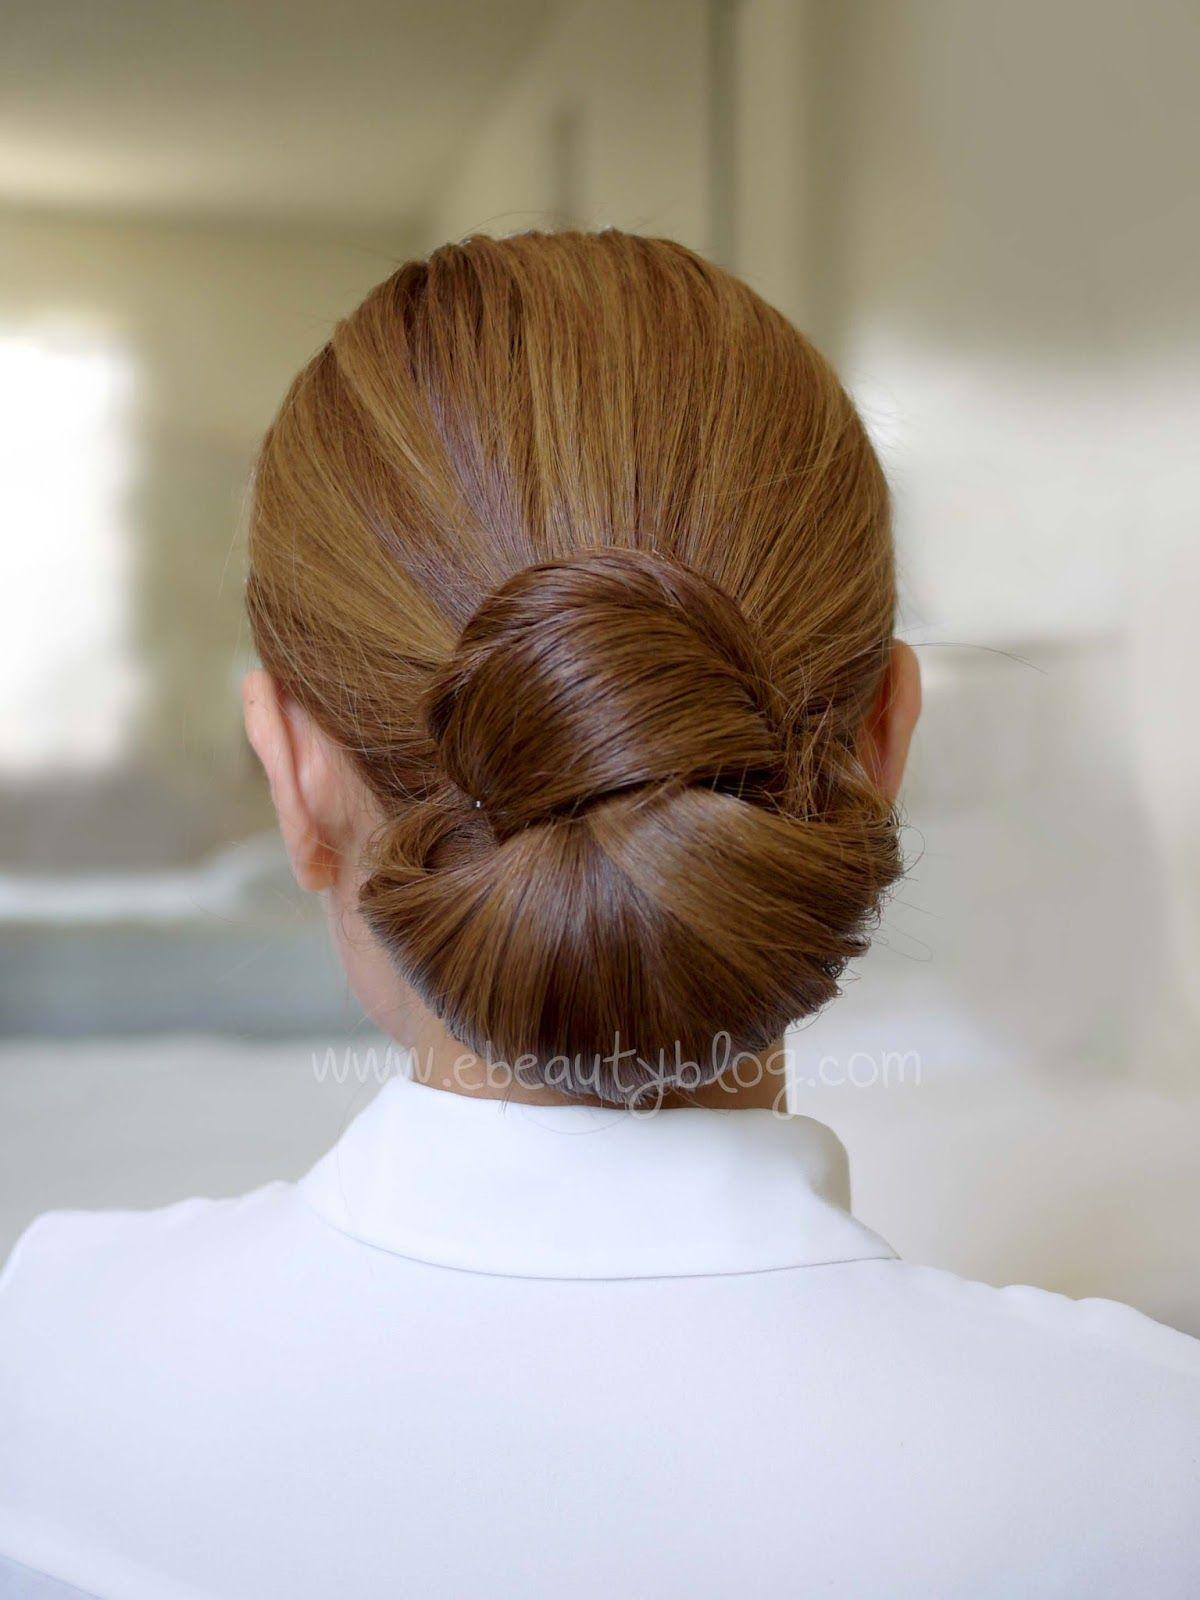 Hair tutorial easy elegance hair bun looks way more complicated